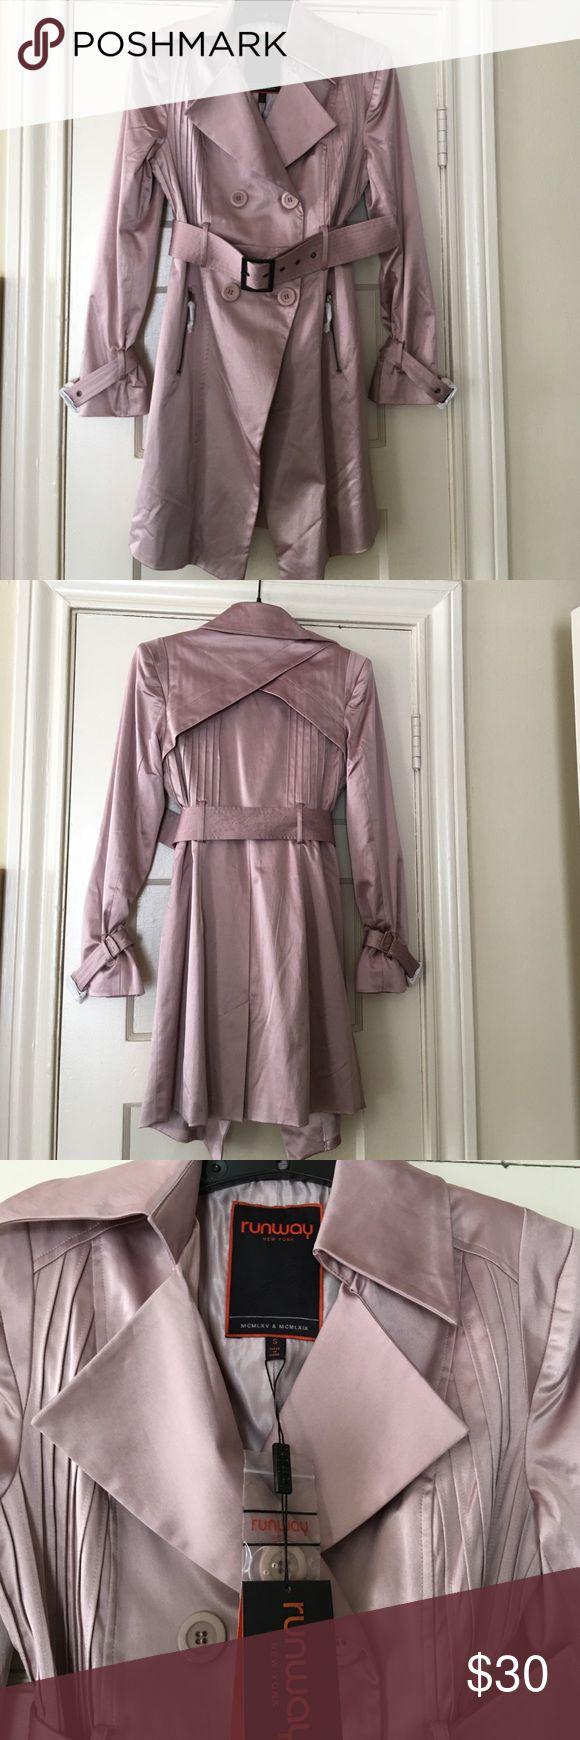 Runway NY Pink Satin Trench Brand new with tags. Size Small. Very dressy Jackets & Coats Trench Coats